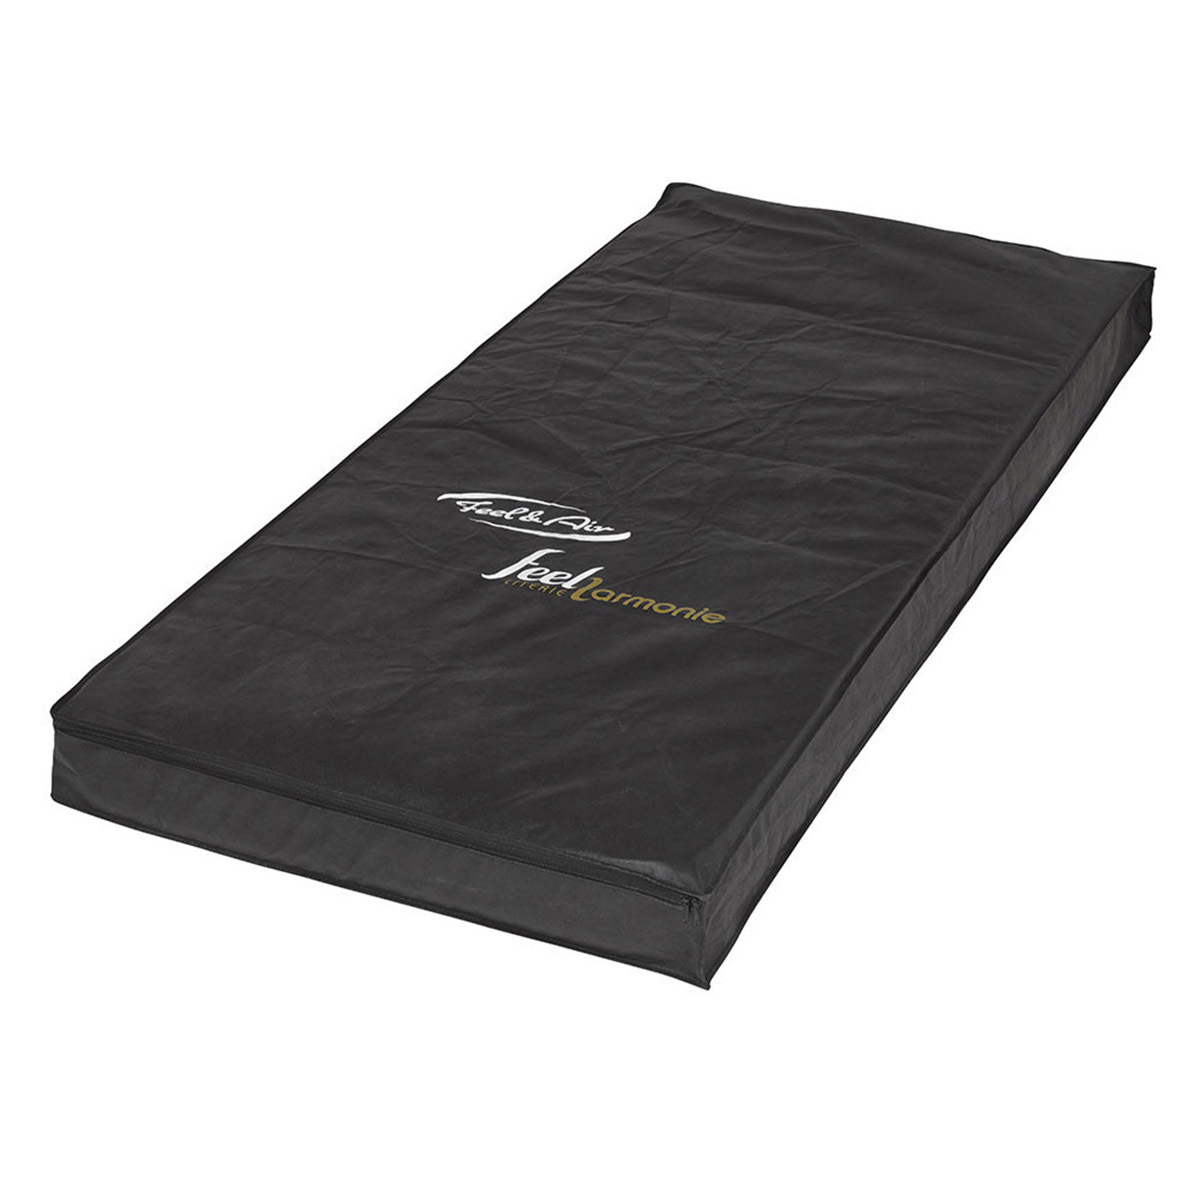 Housse de rangement de matelas Tissu 90x190 Noir